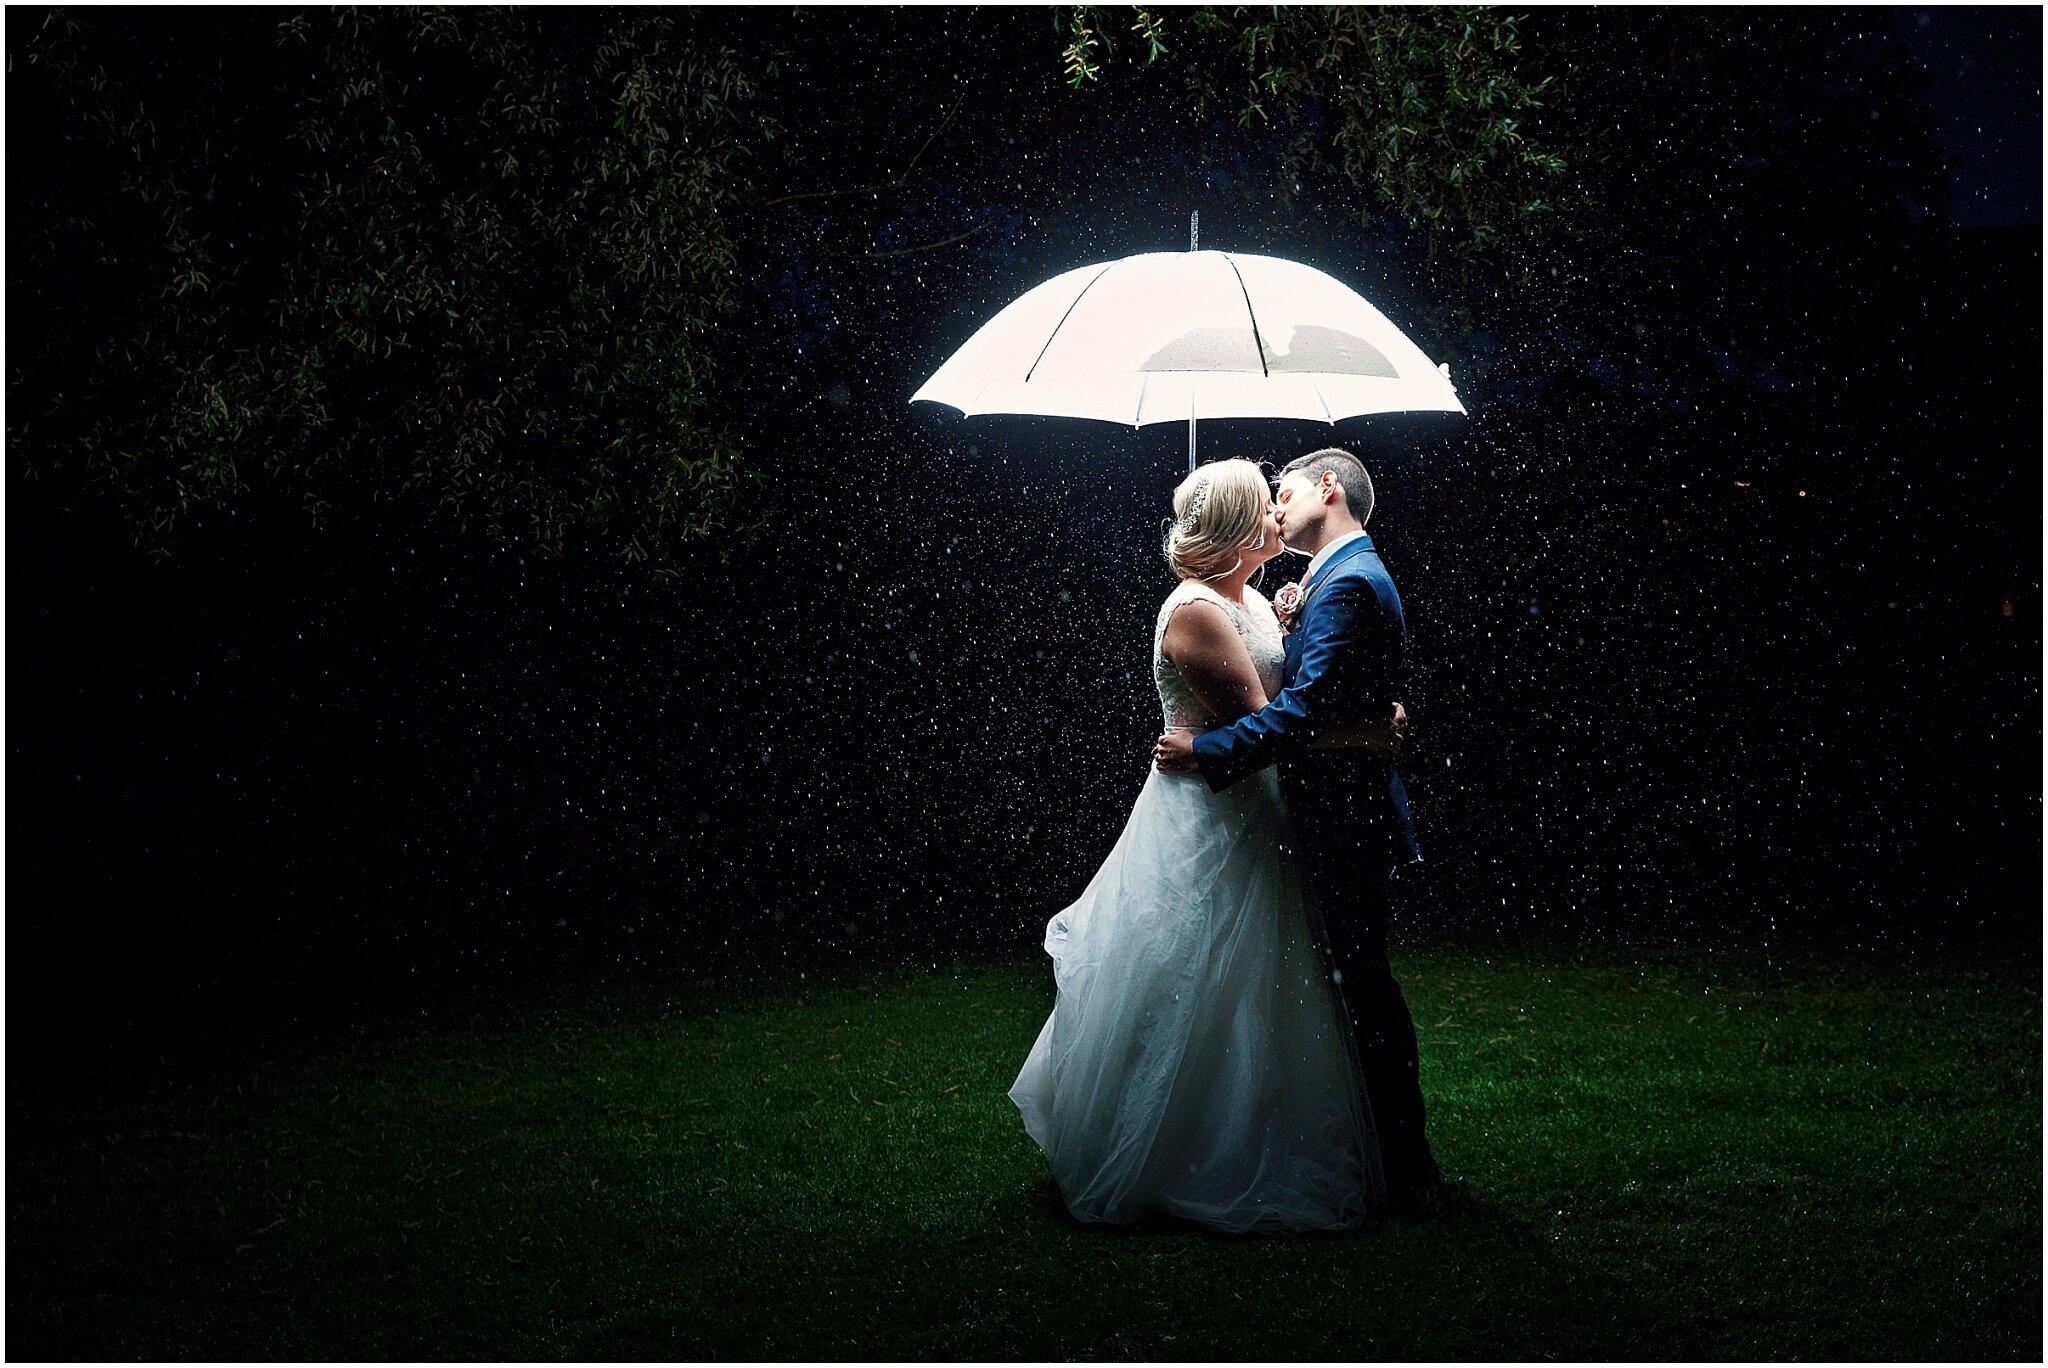 Wet wedding solution